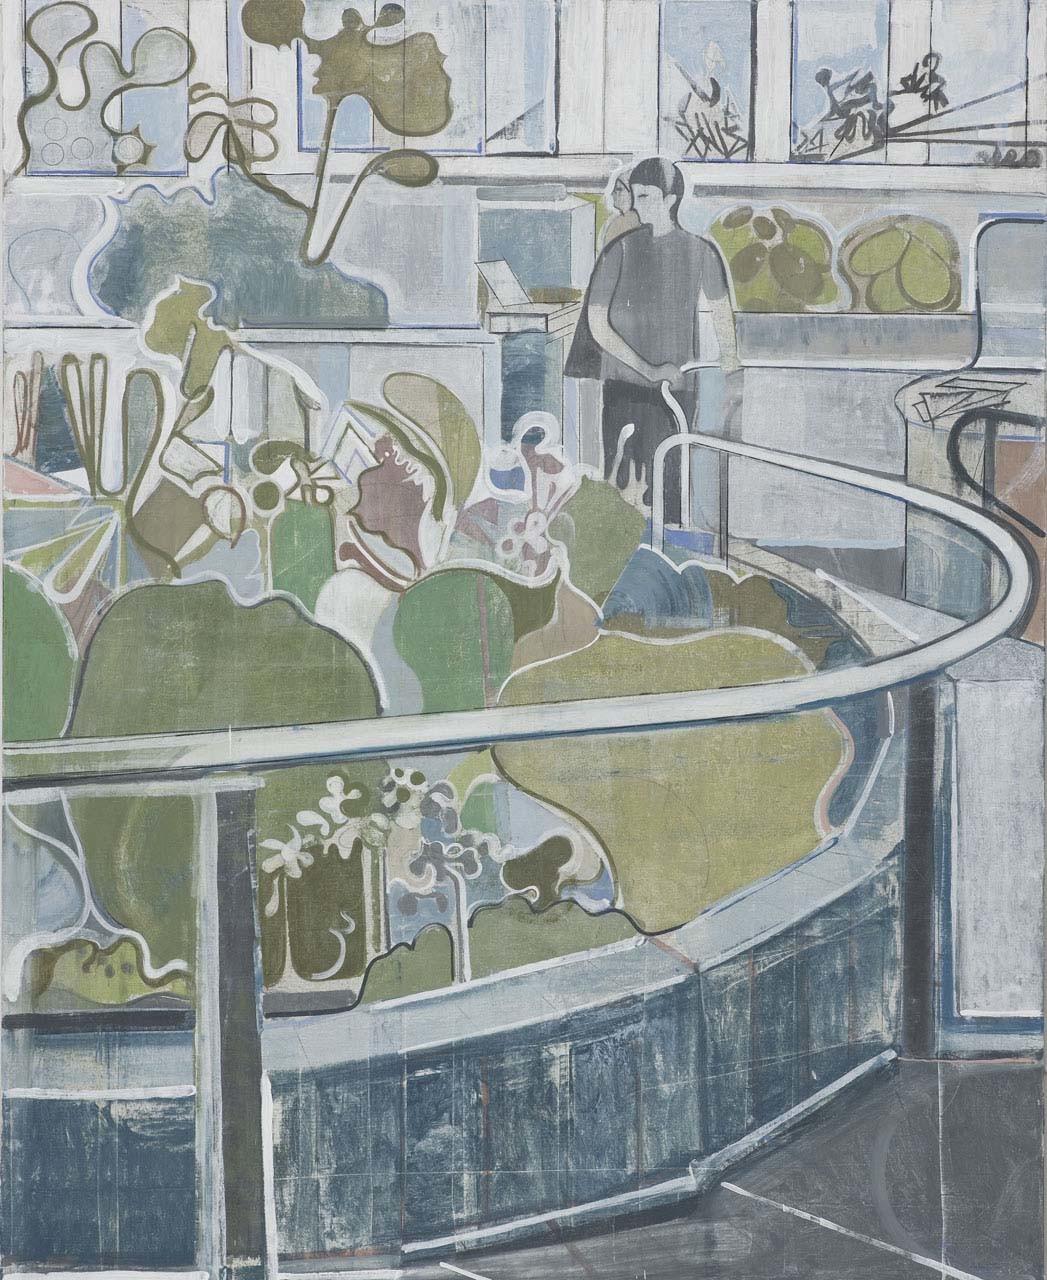 <p>Untitled (Huntington Gardens no. 3), 2008</p>